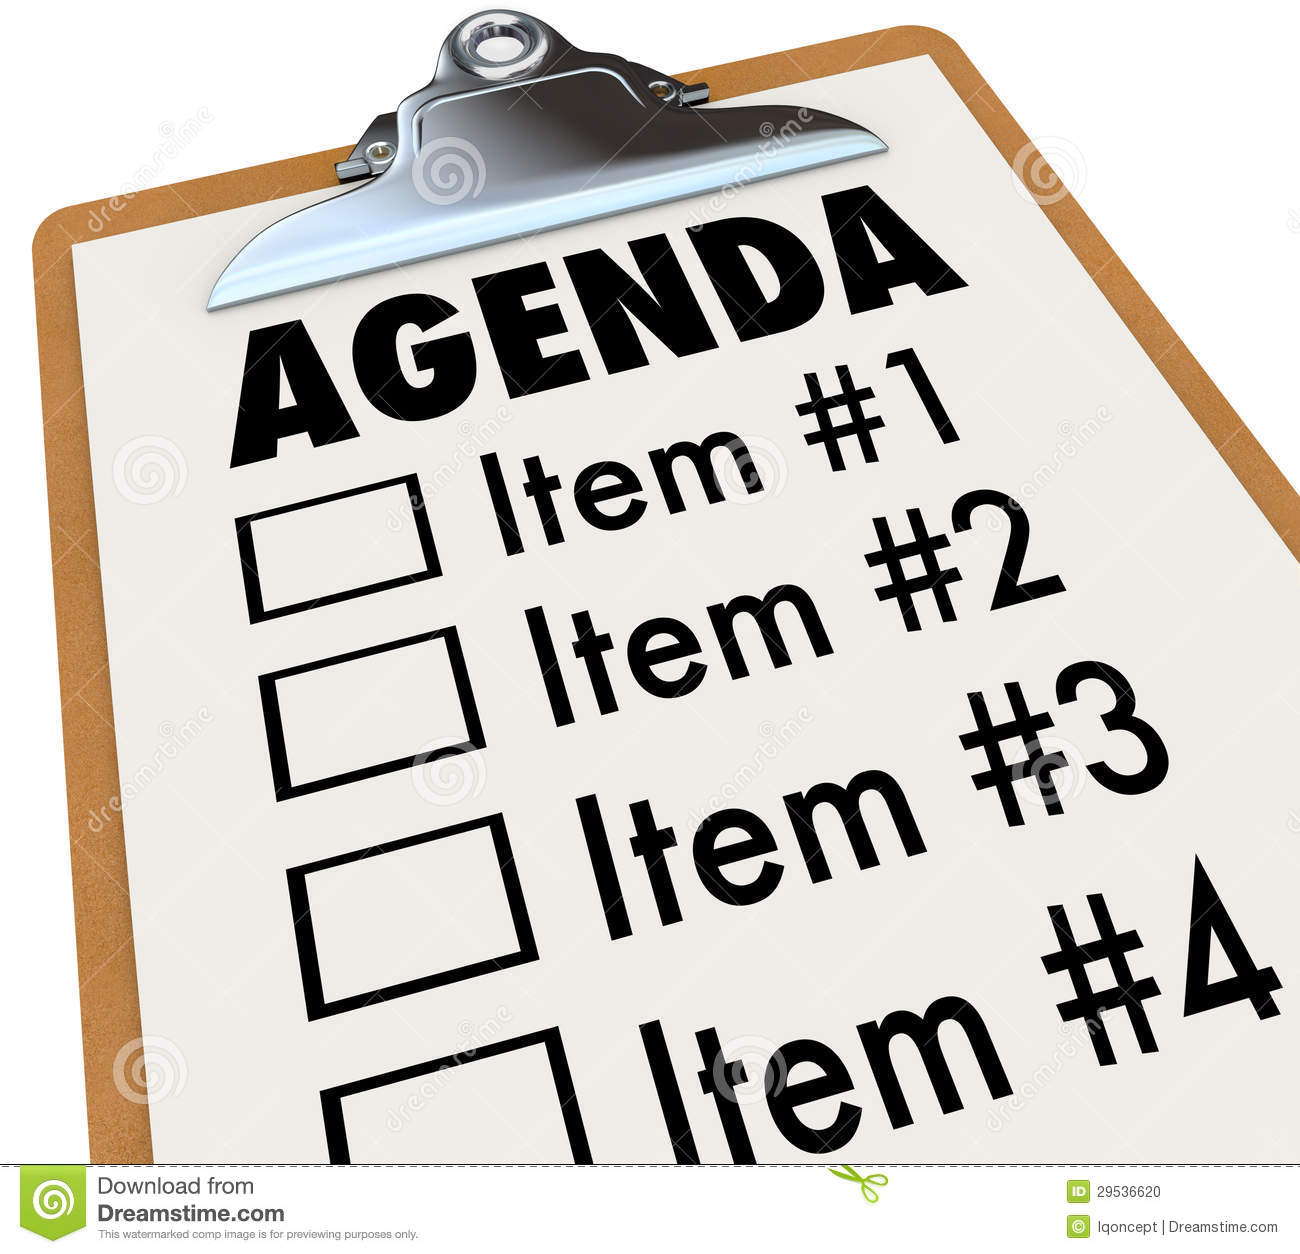 Meeting Agenda Clipart.